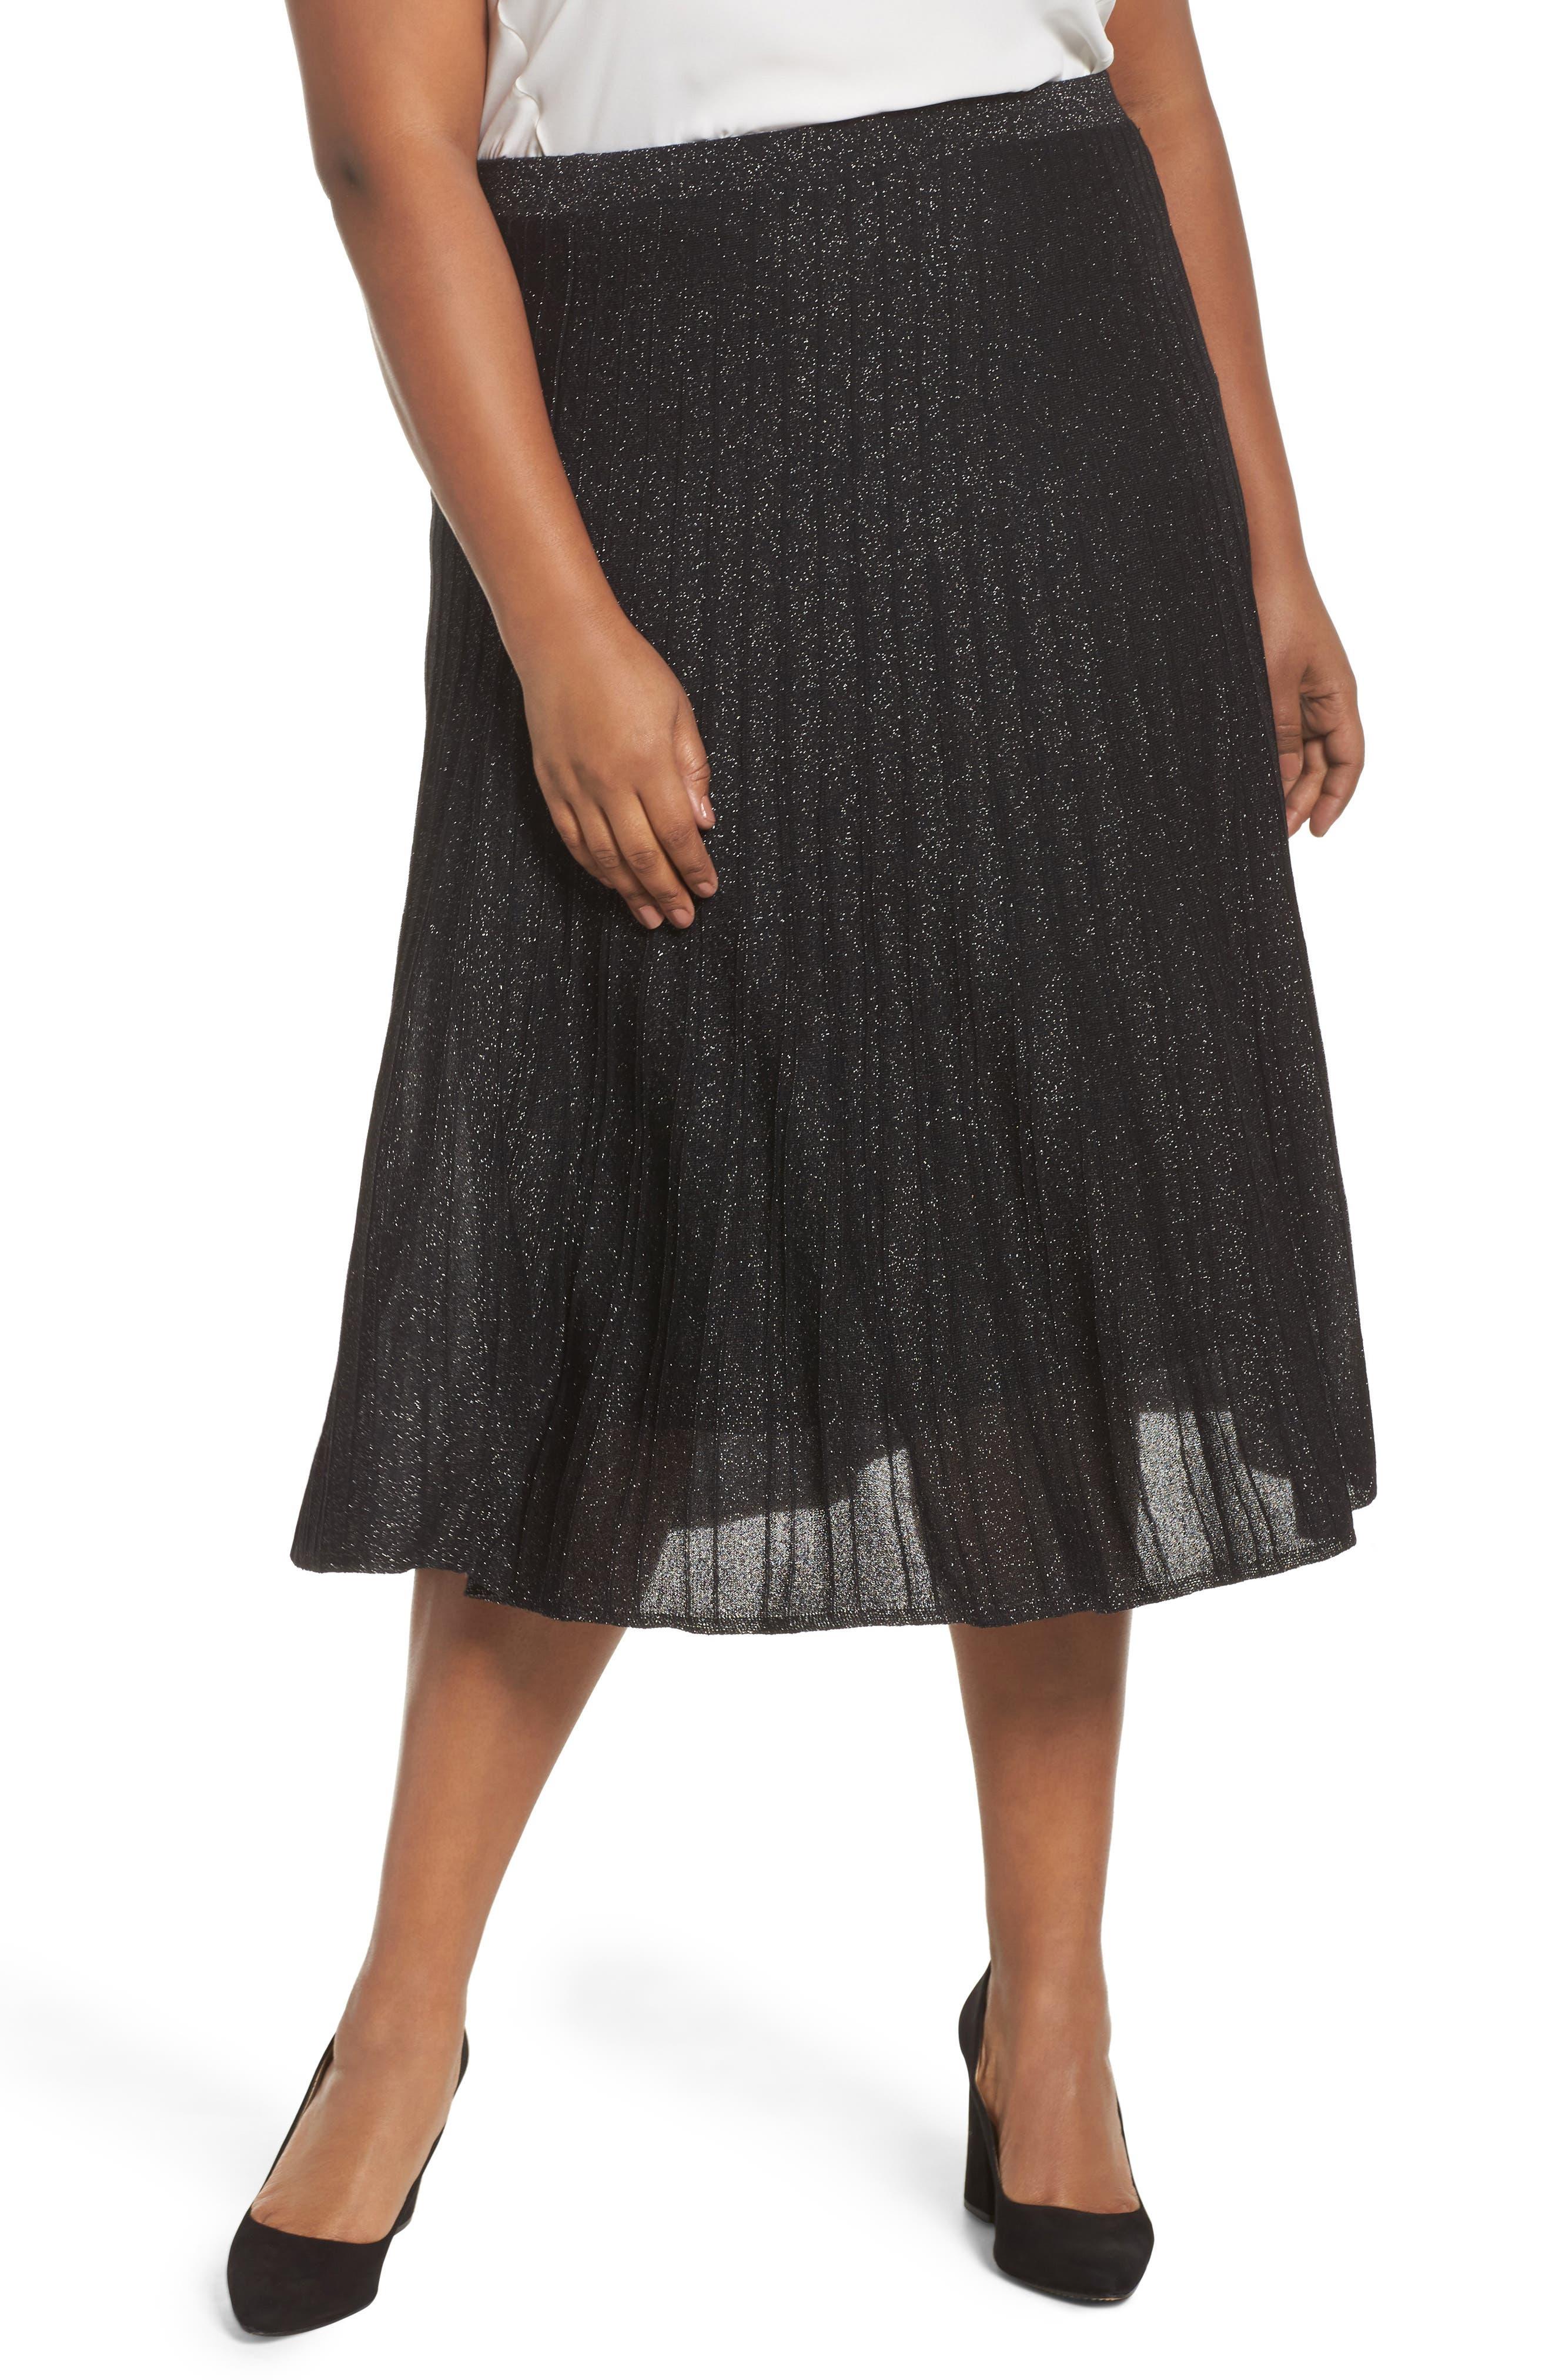 Luminary Skirt,                         Main,                         color, Black Mix